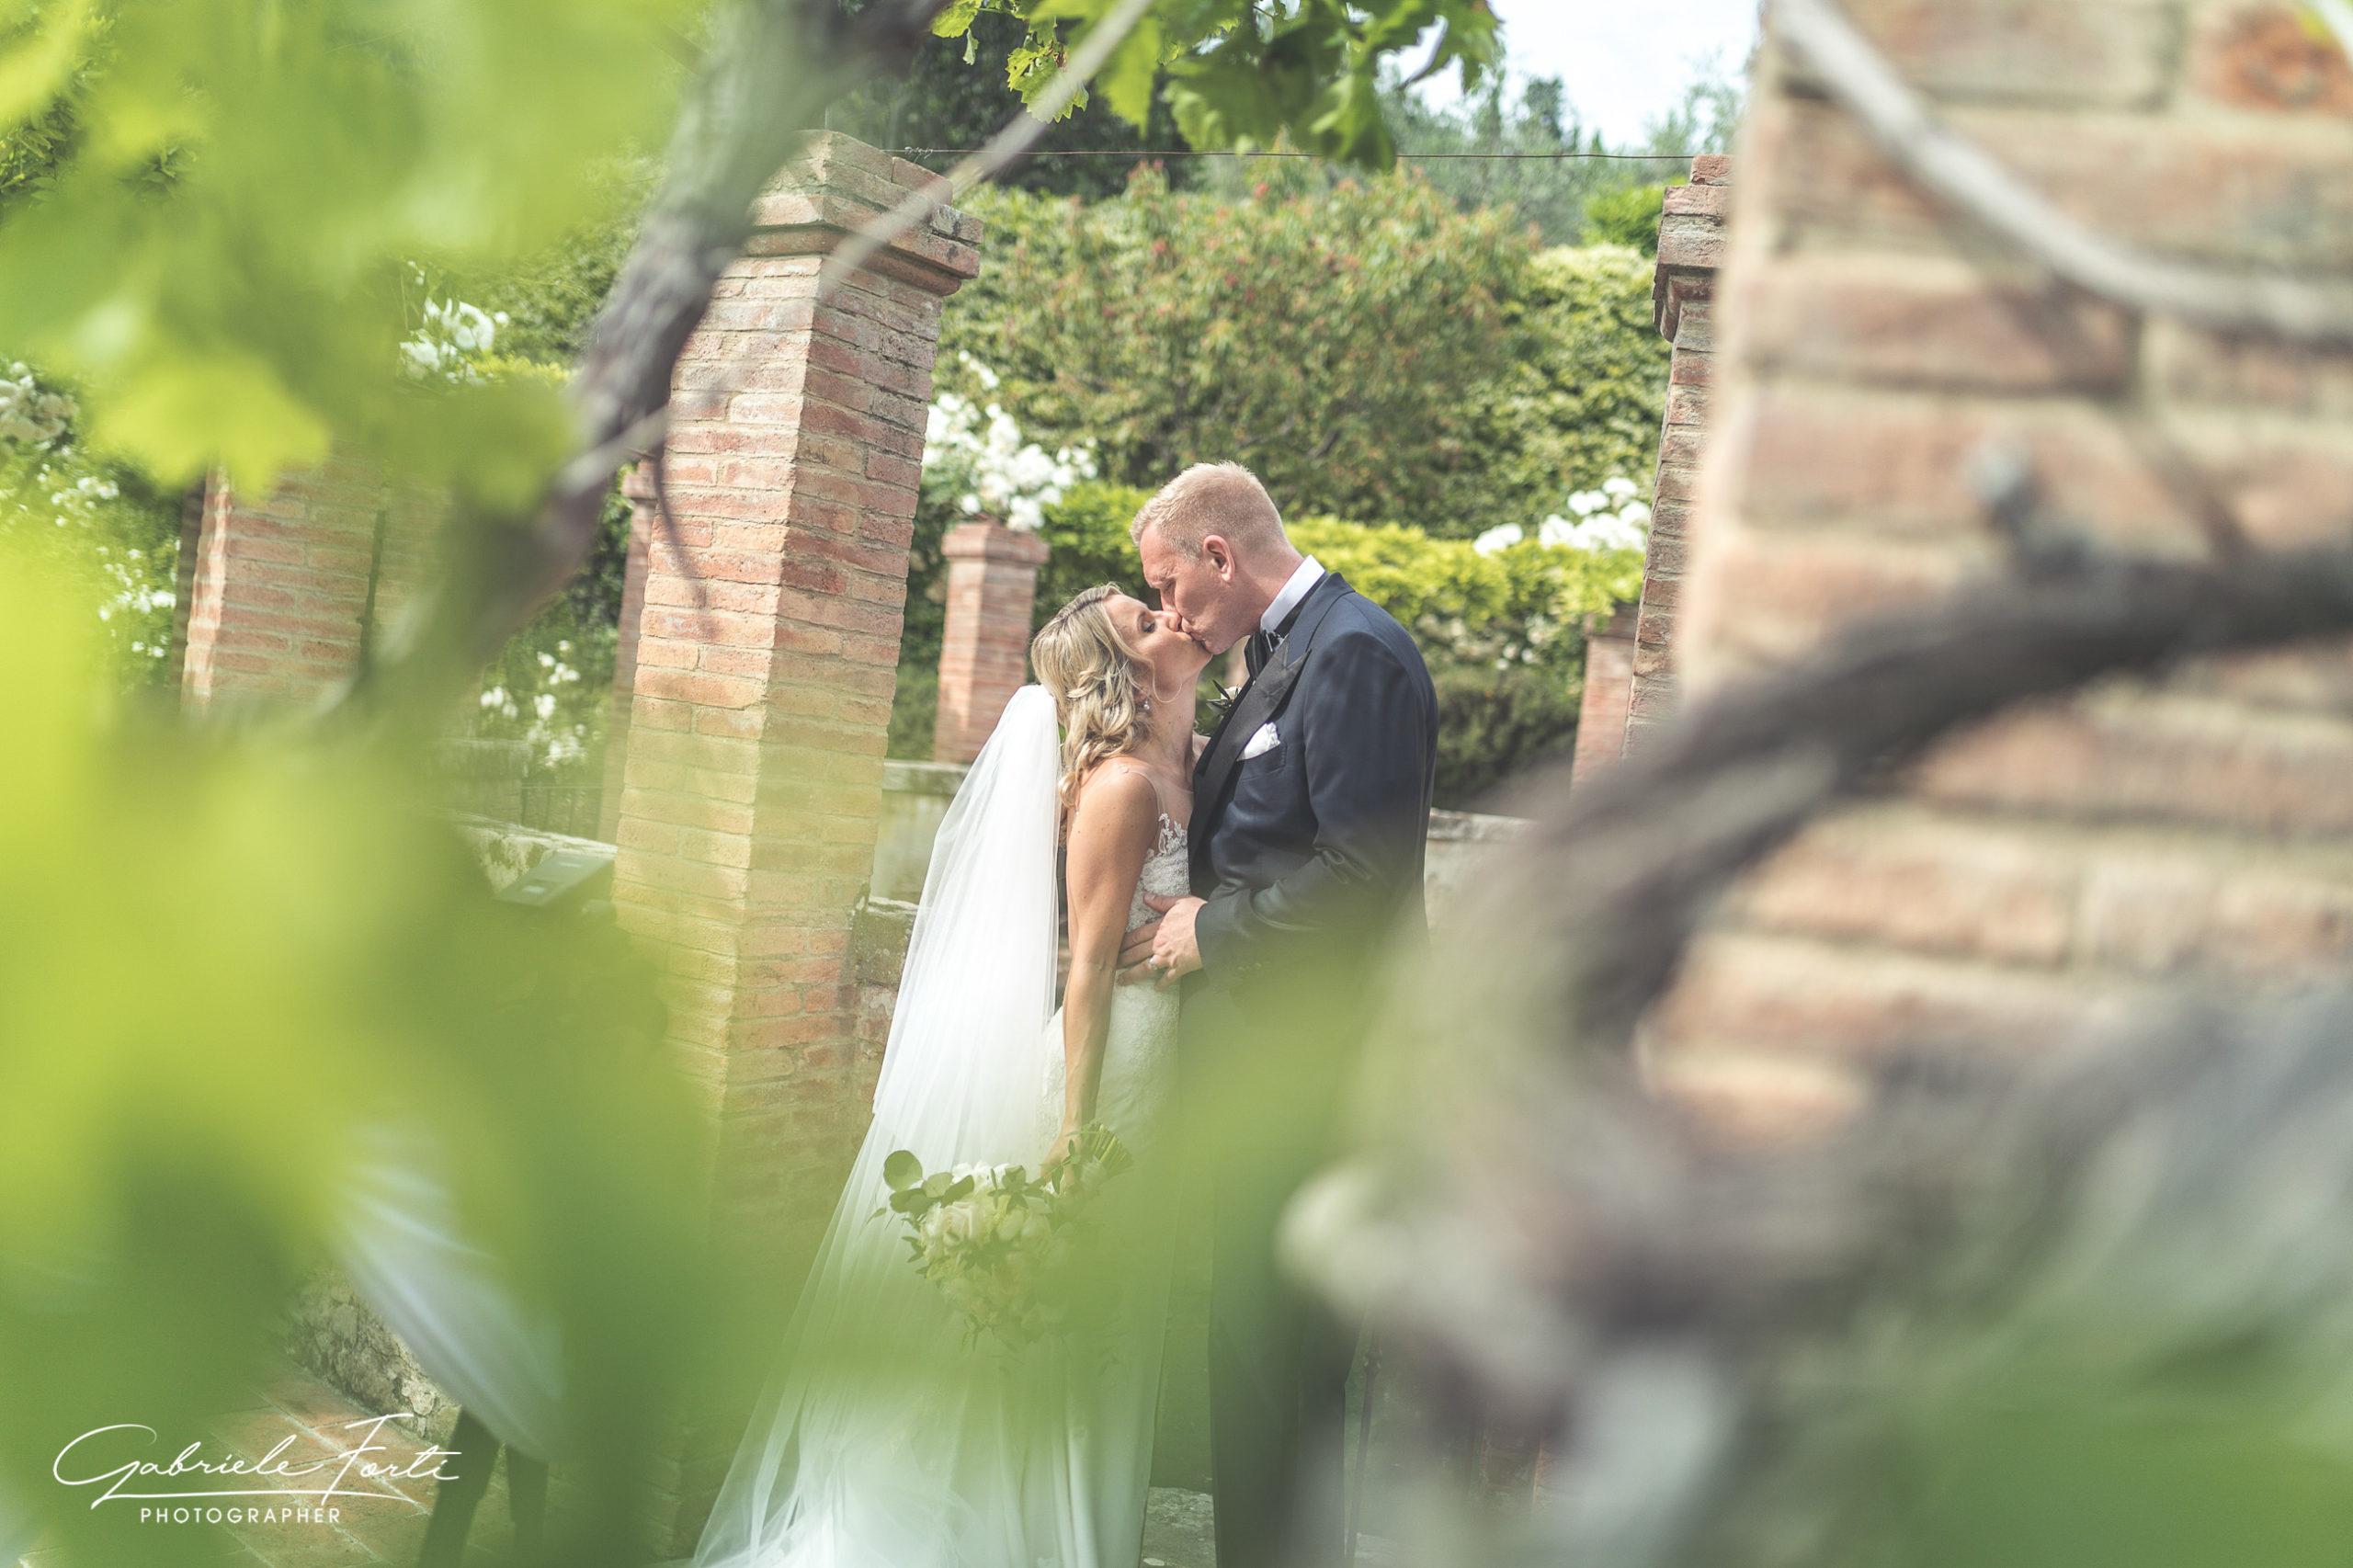 wedding-cortona-tuscany-italy-photographer-foto-forti-gabriele-5